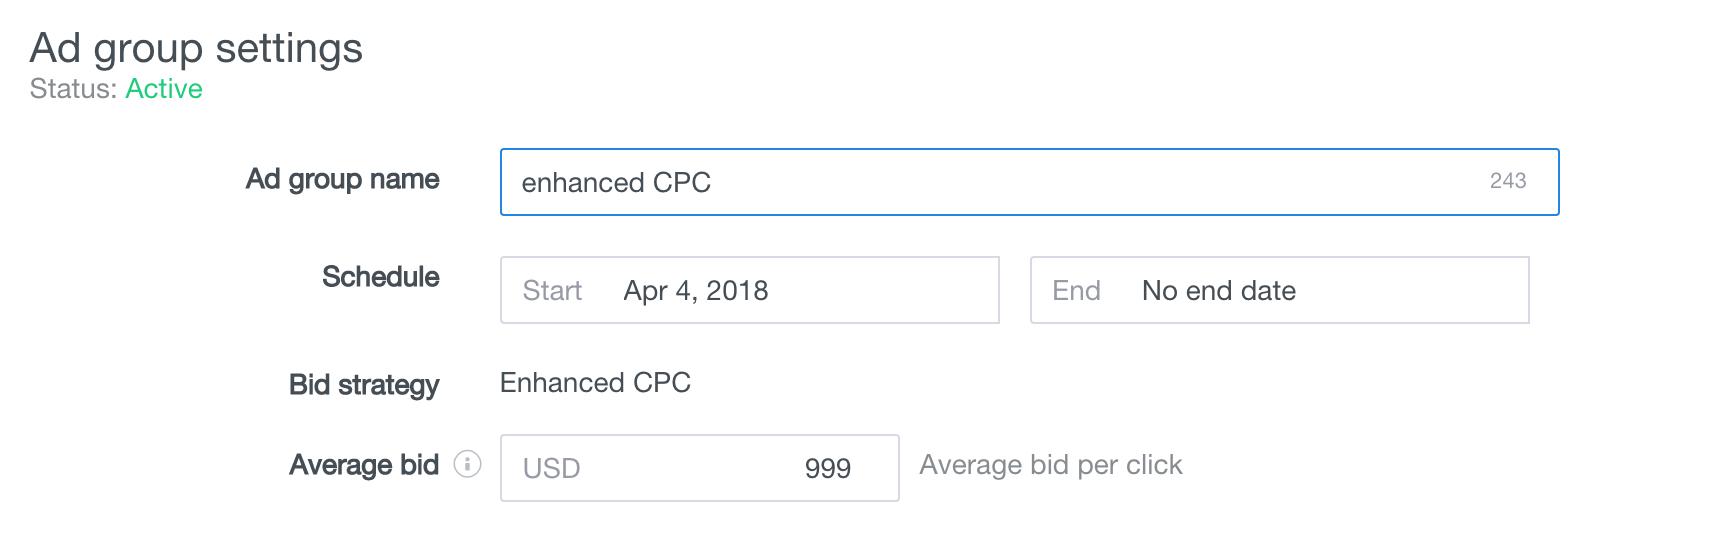 bid strategy enhanced cpc